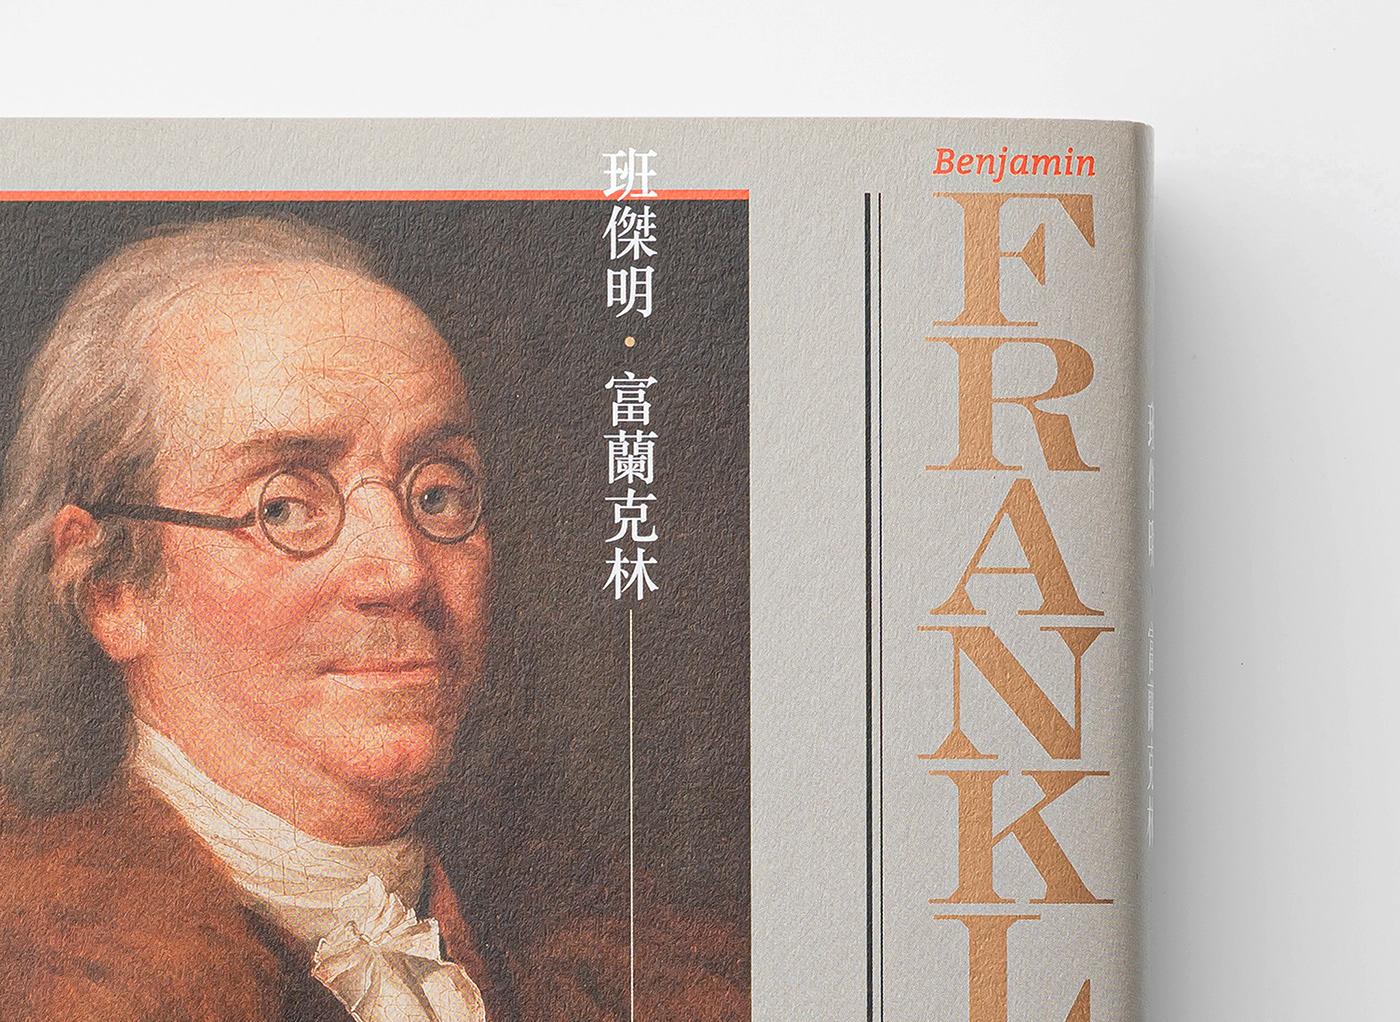 Image may contain: man, human face and book